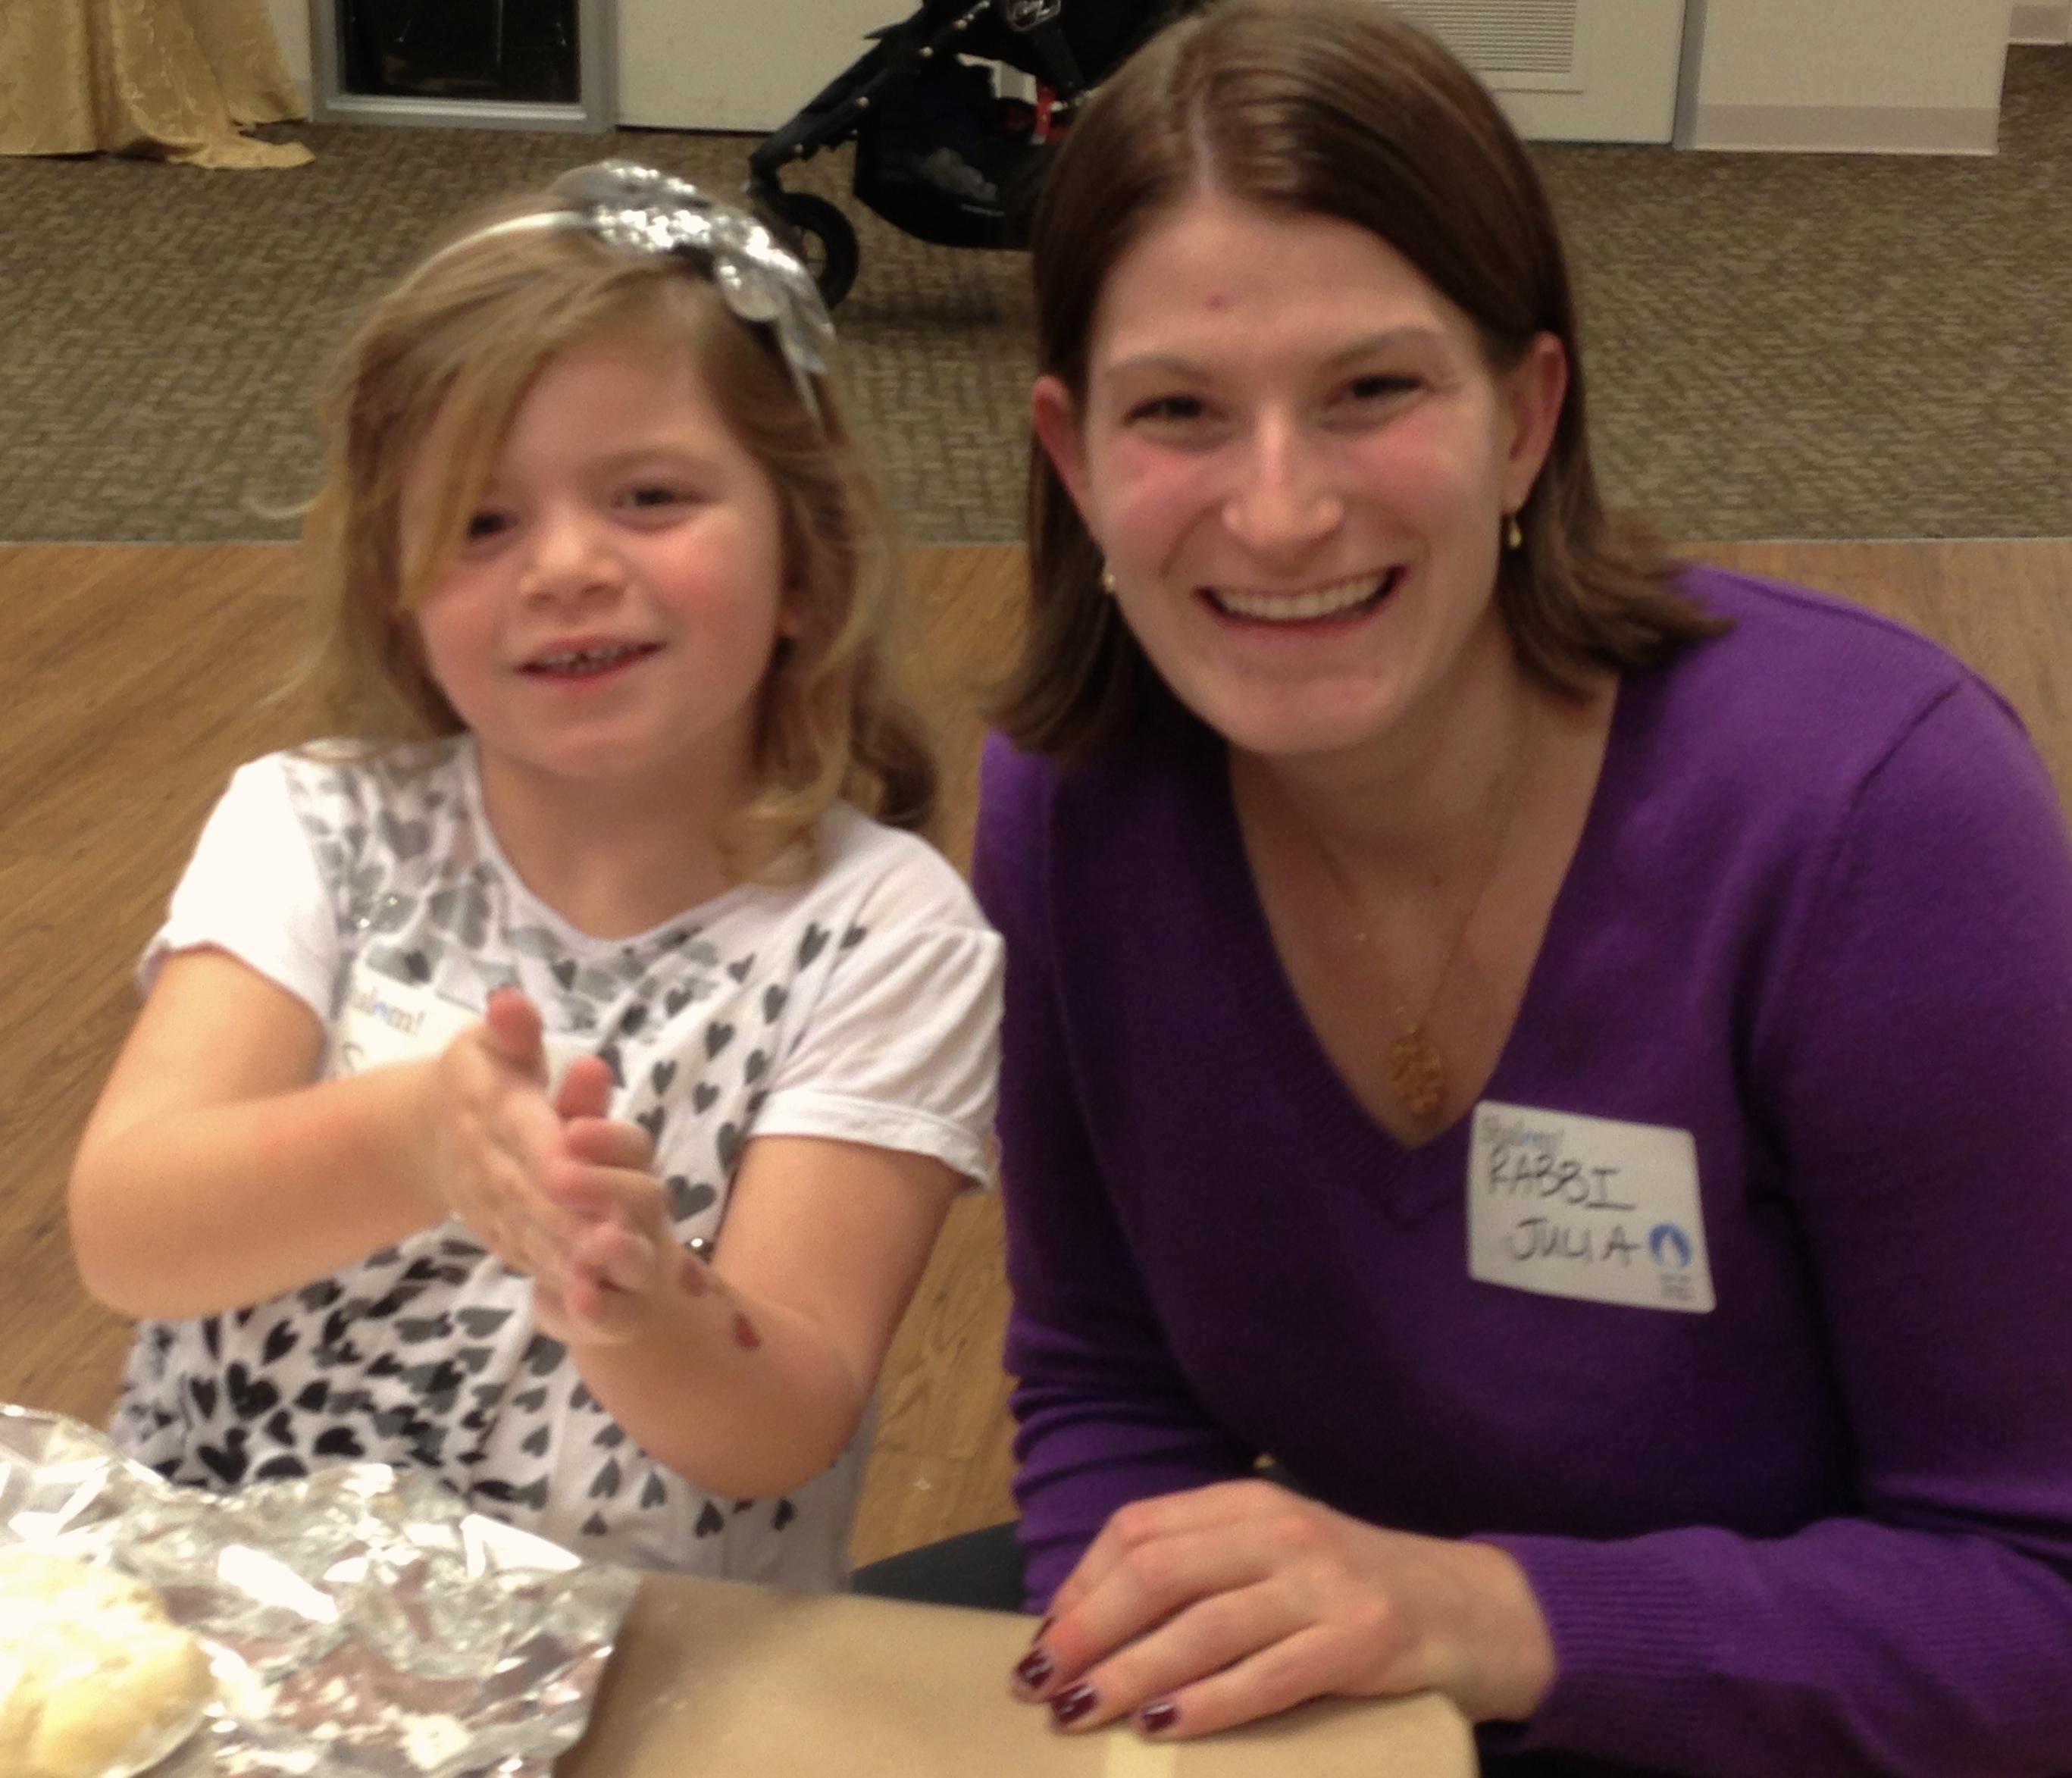 Rabbi Julia and little girl